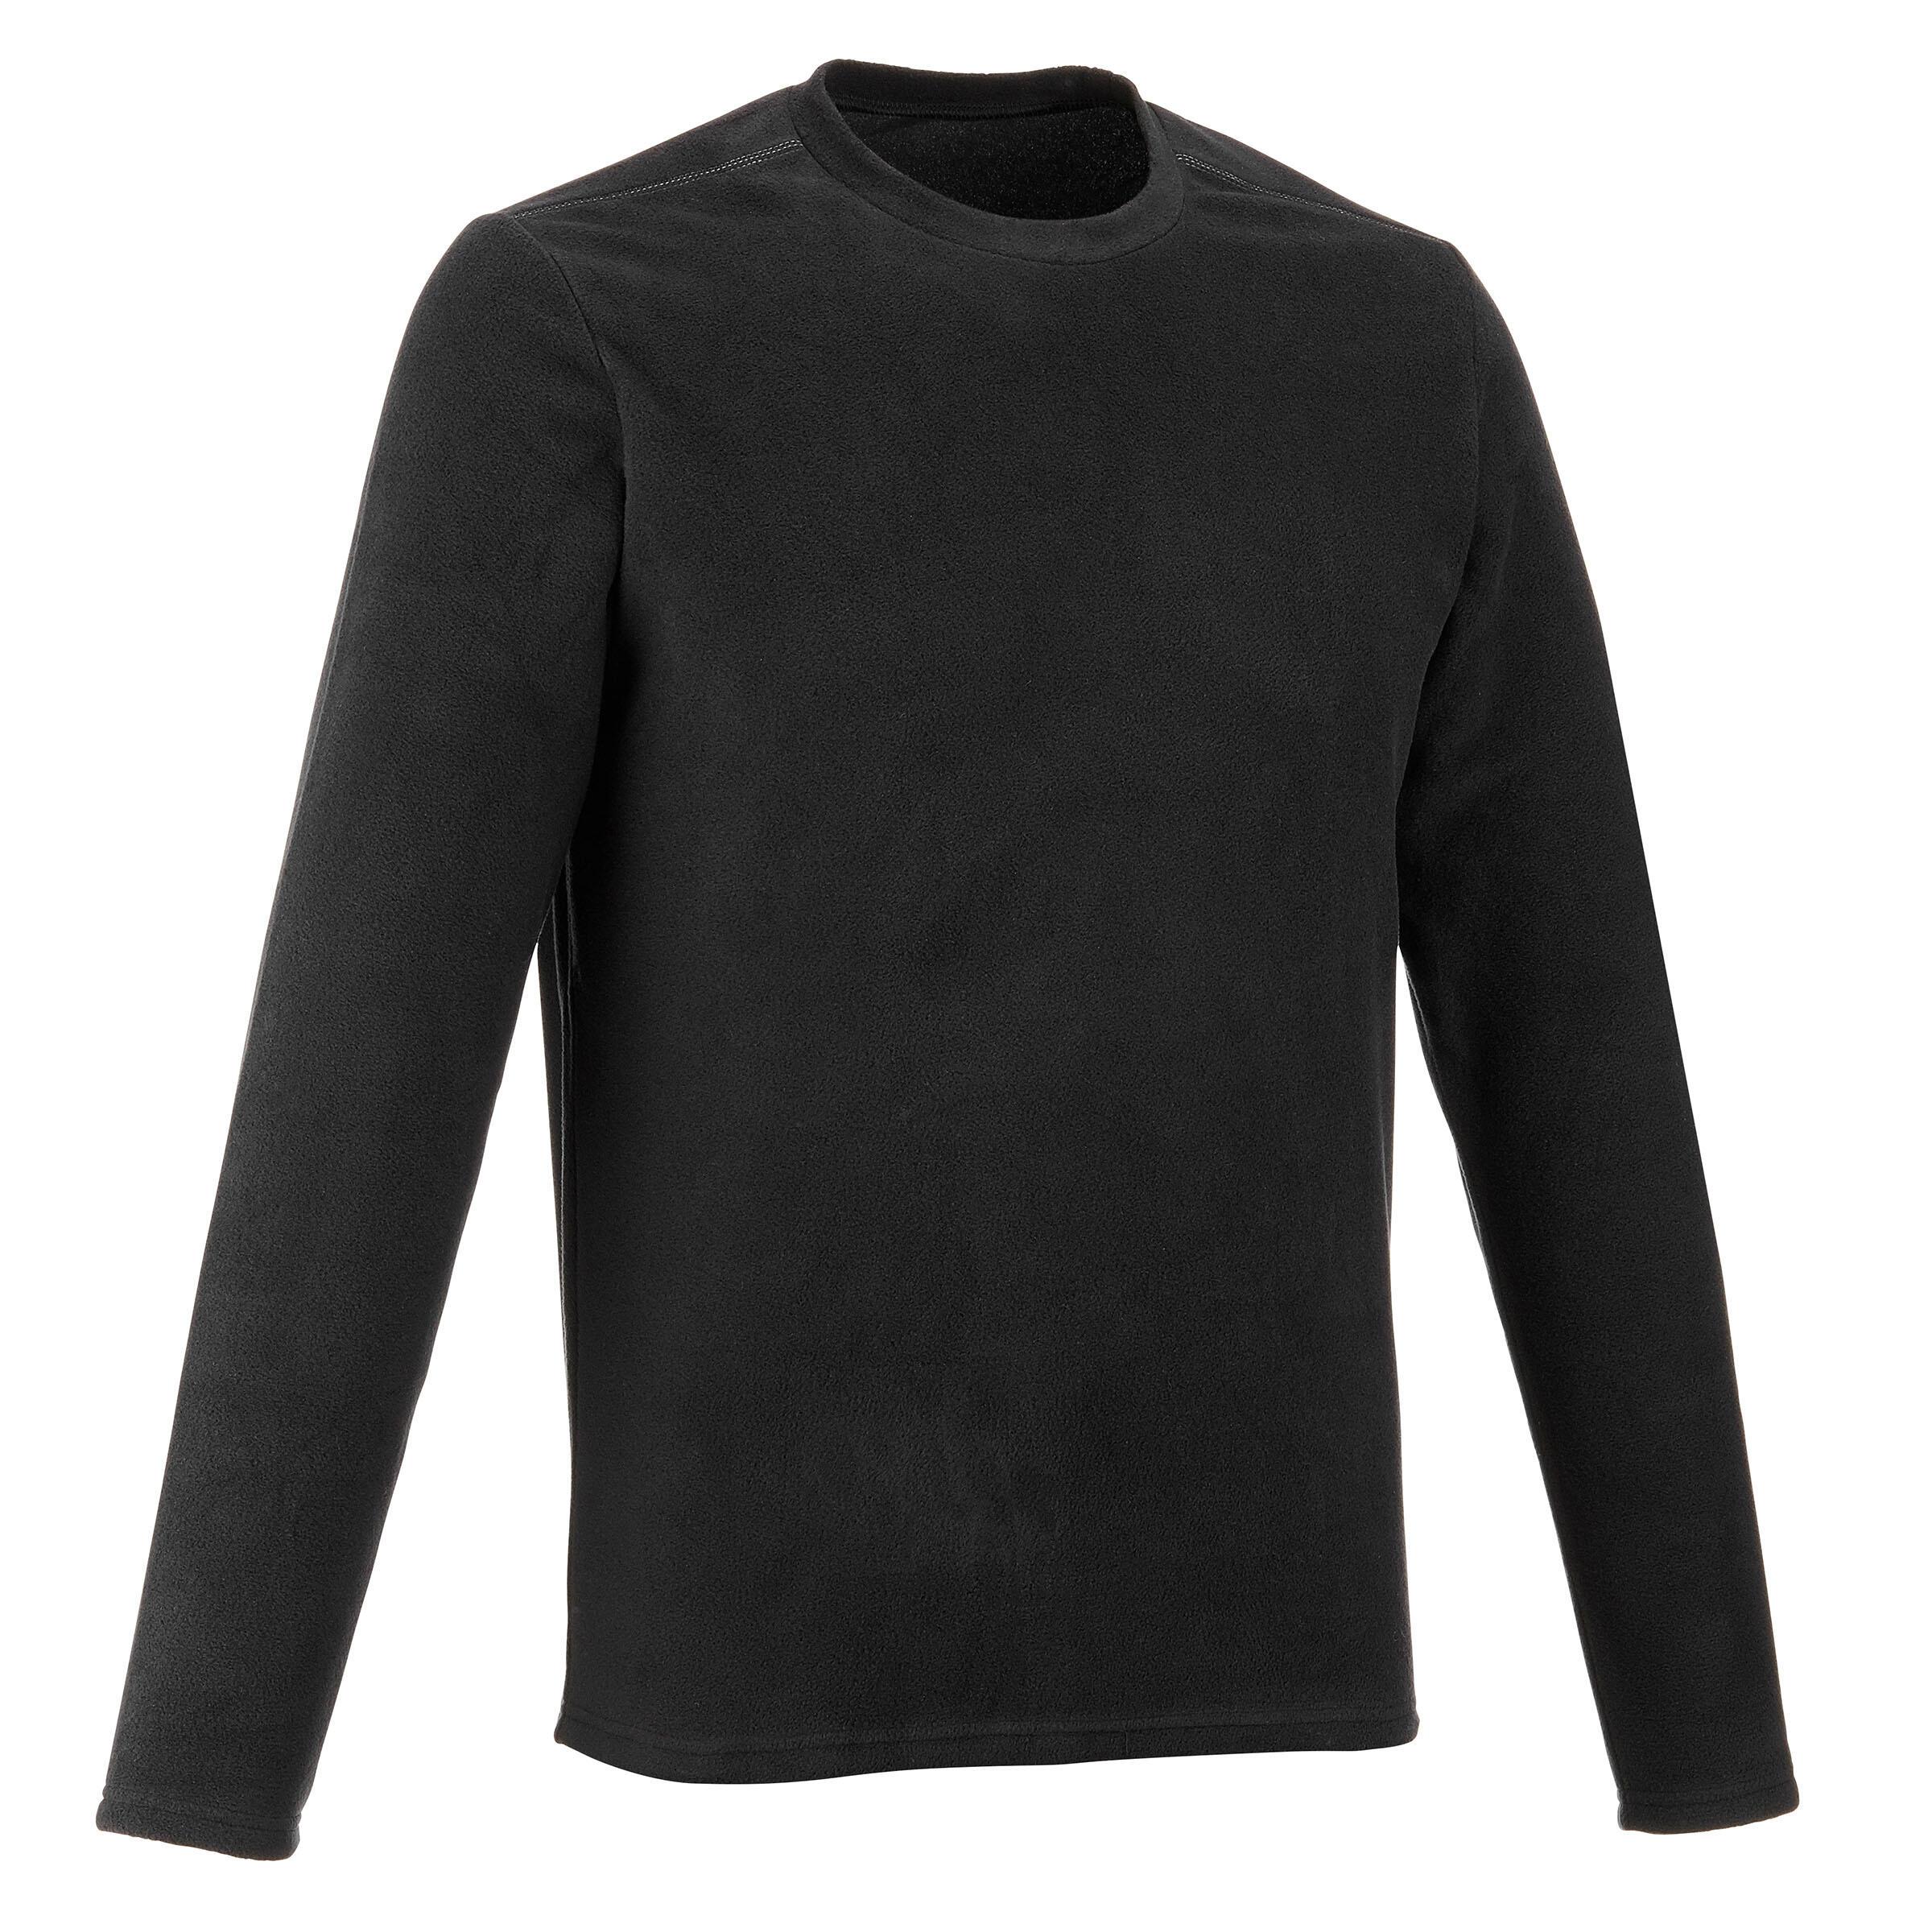 Forclaz 20 Men's Hiking Fleece - Black